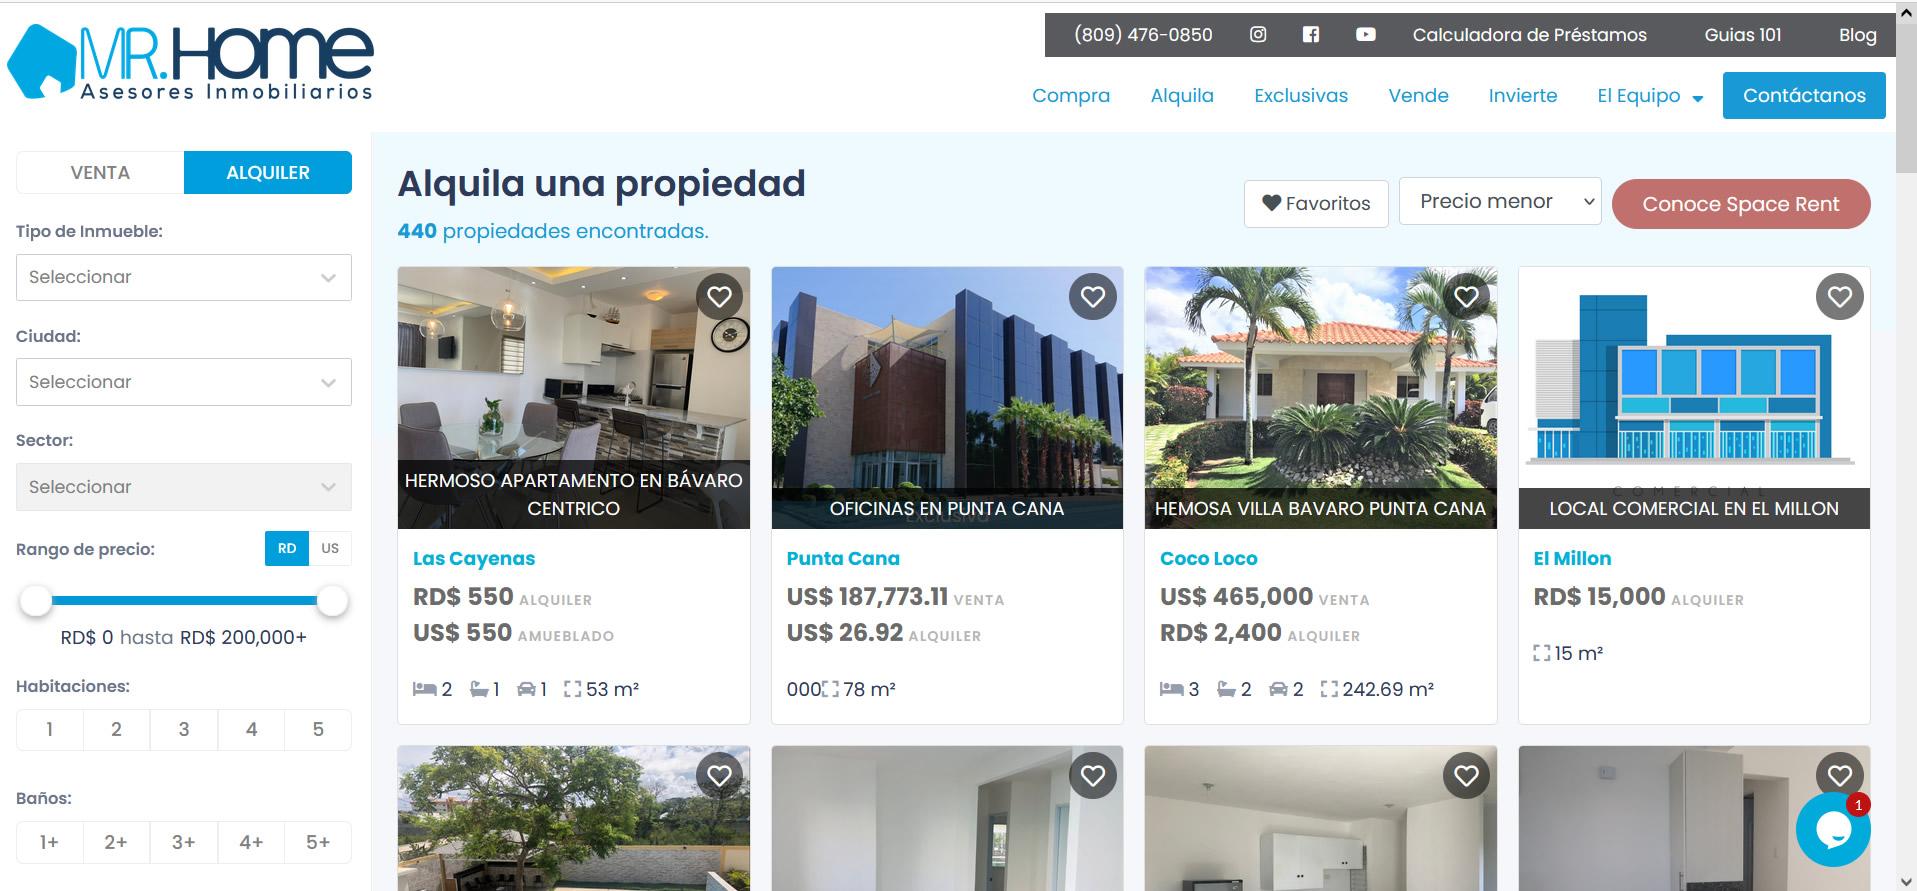 mr-home-listing-page.jpg